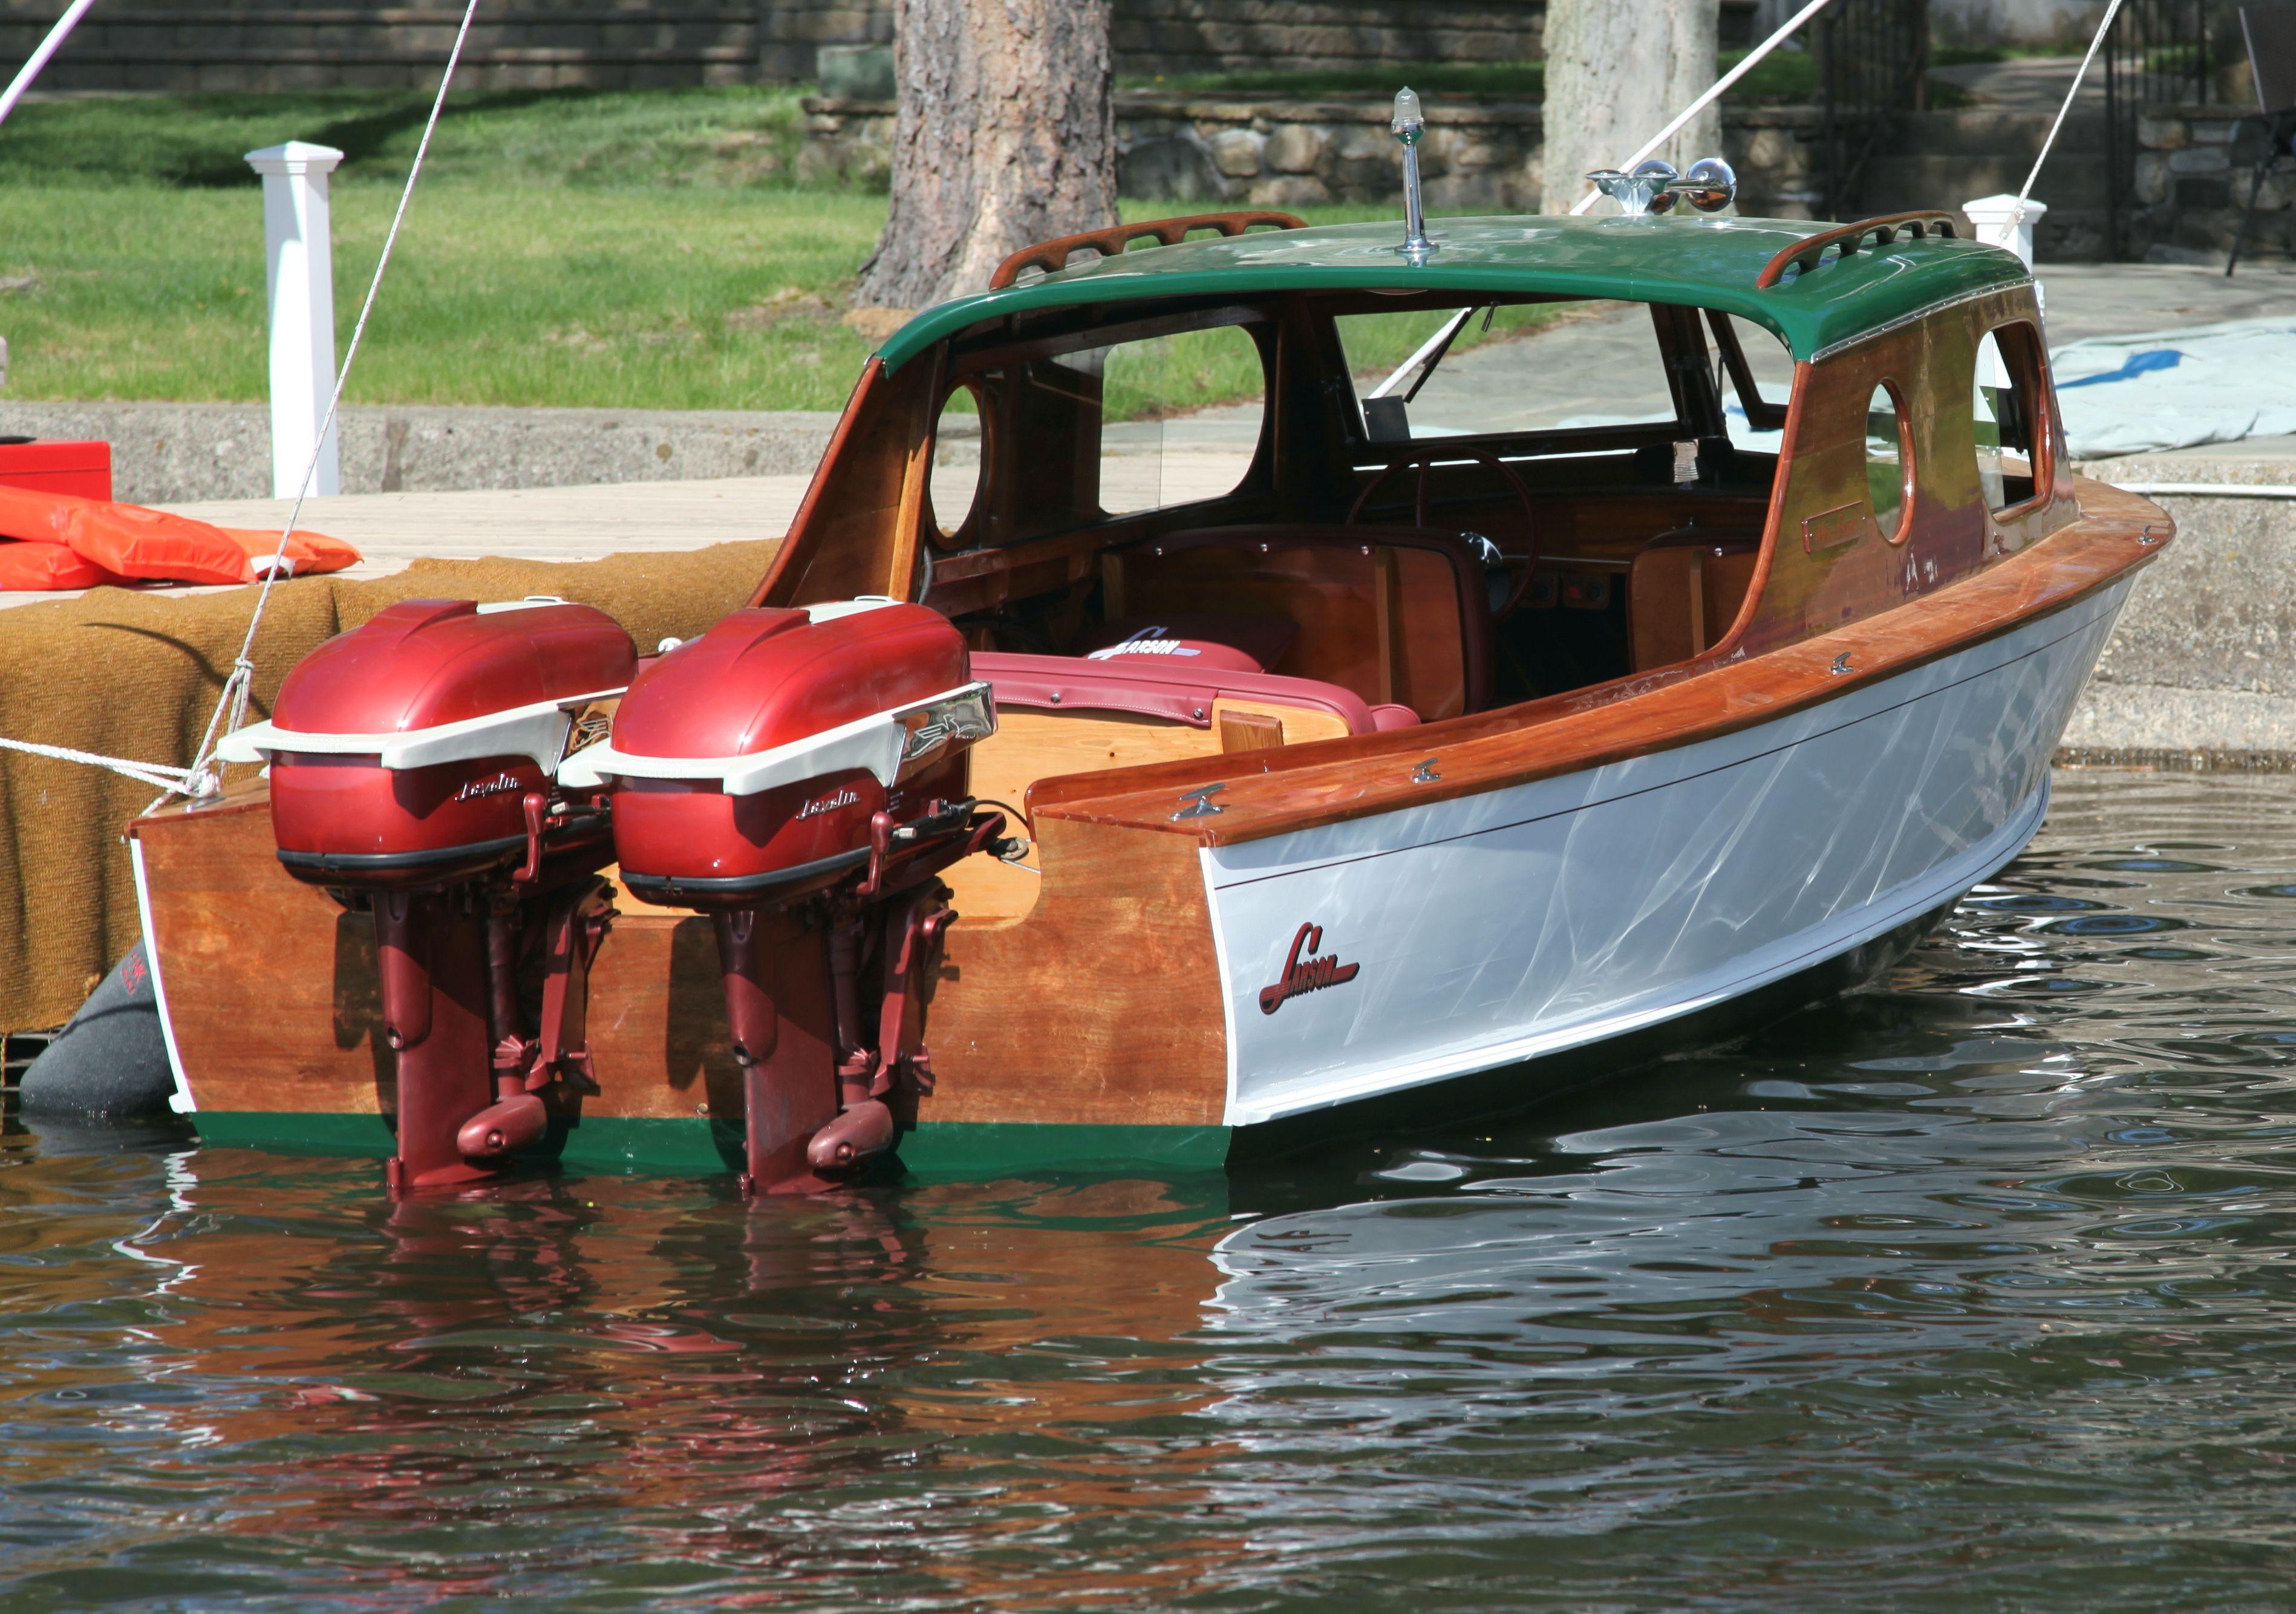 1955 Larsen Outboard Boat Motors Vintage Boats Classic Wooden Boats